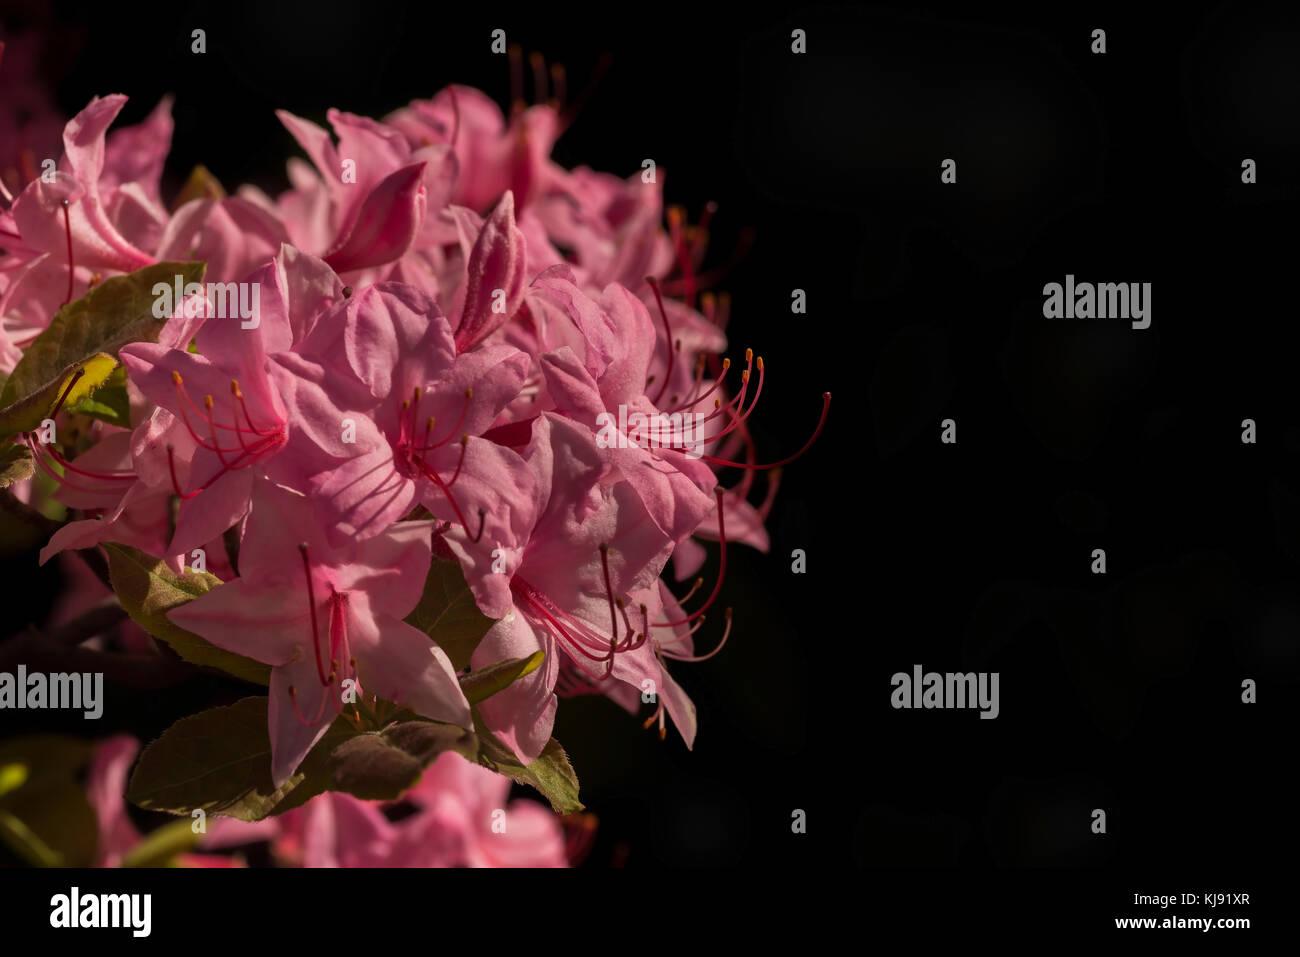 Pink azalea flowers in dappled spring sunlight - Stock Image